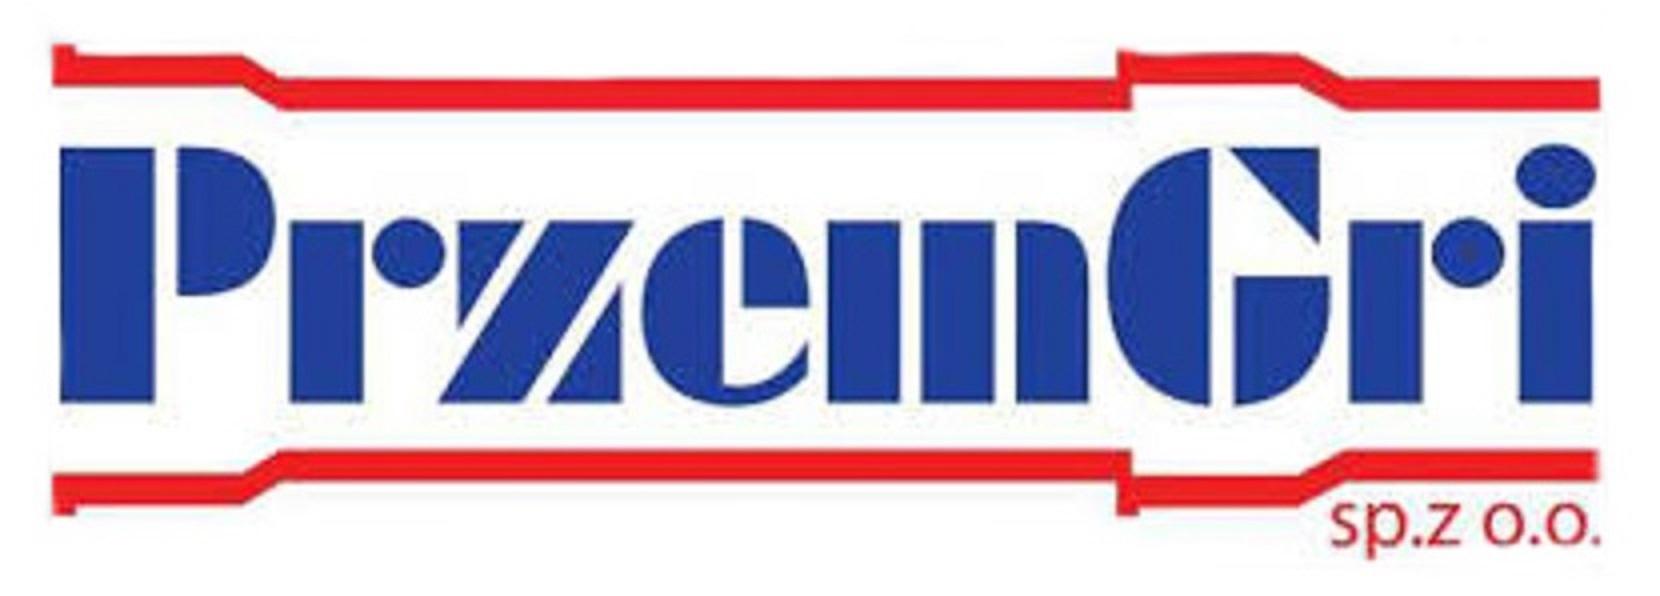 duze logo2